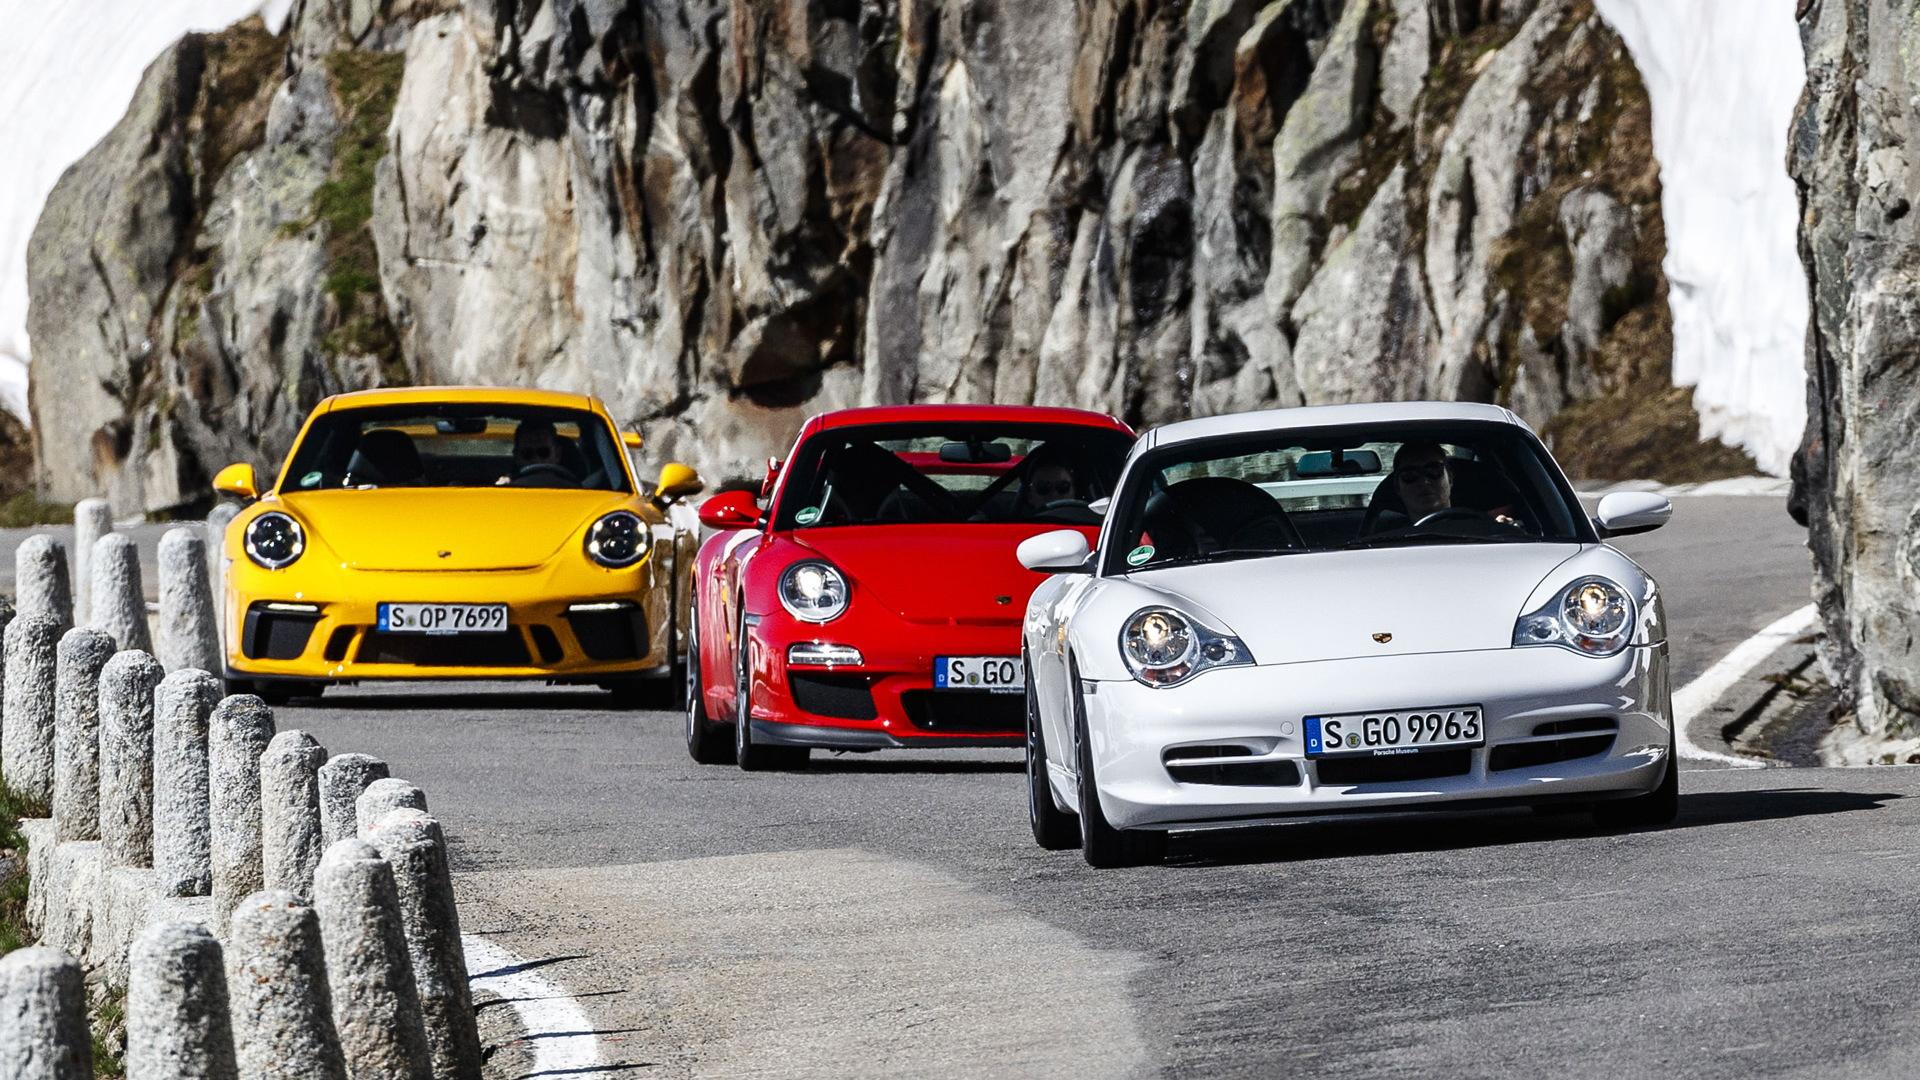 996, 997 and 991 Porsche 911 GT3 generations